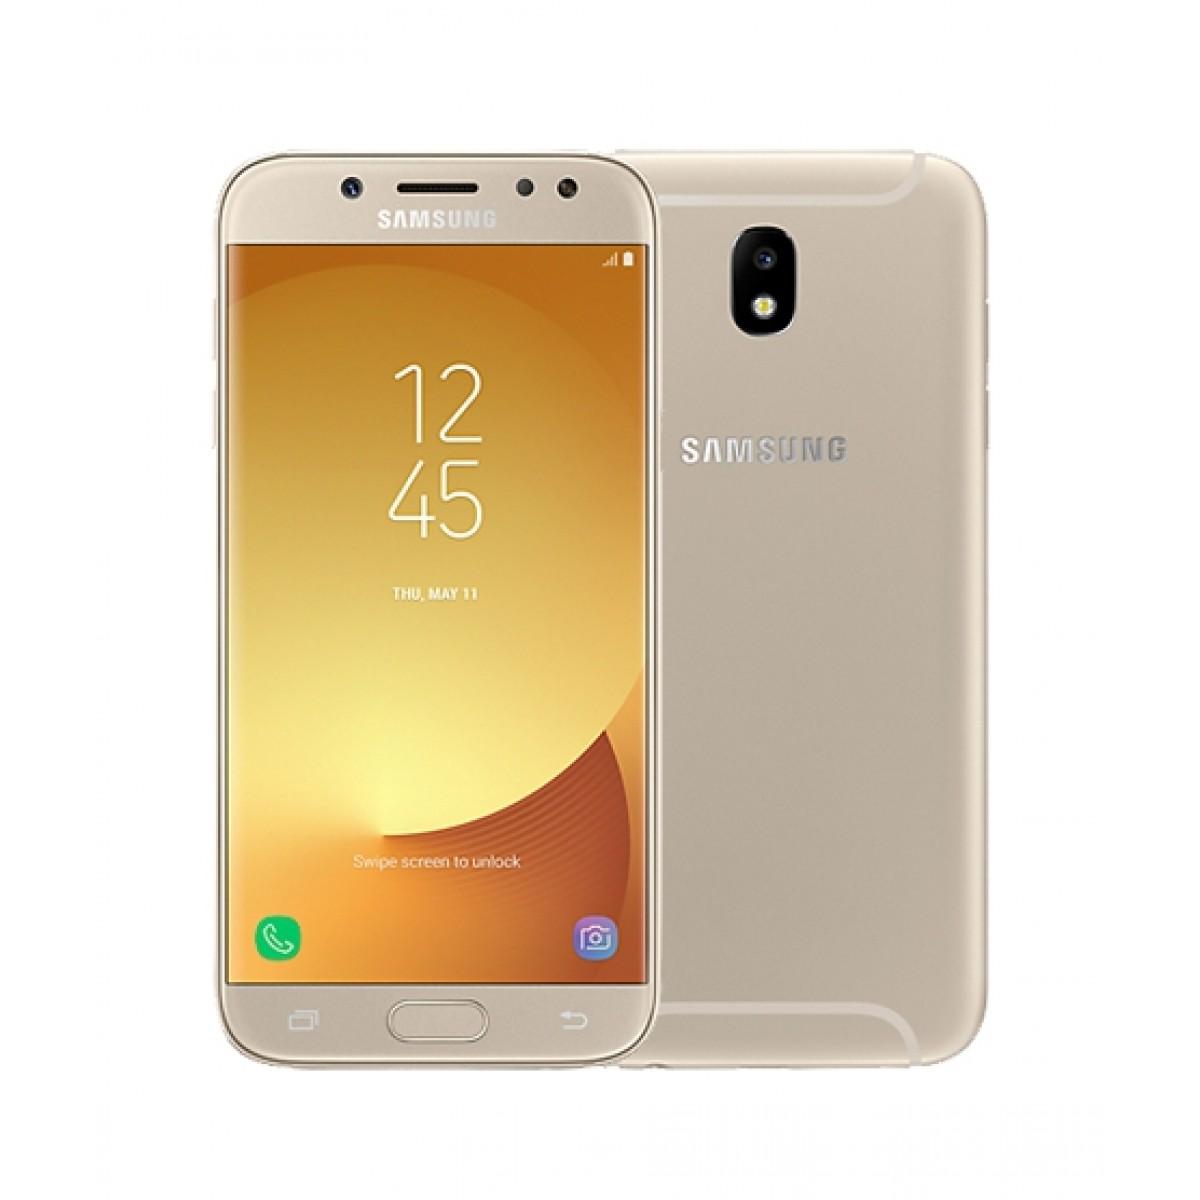 Samsung Galaxy J5 Pro Price In Pakistan